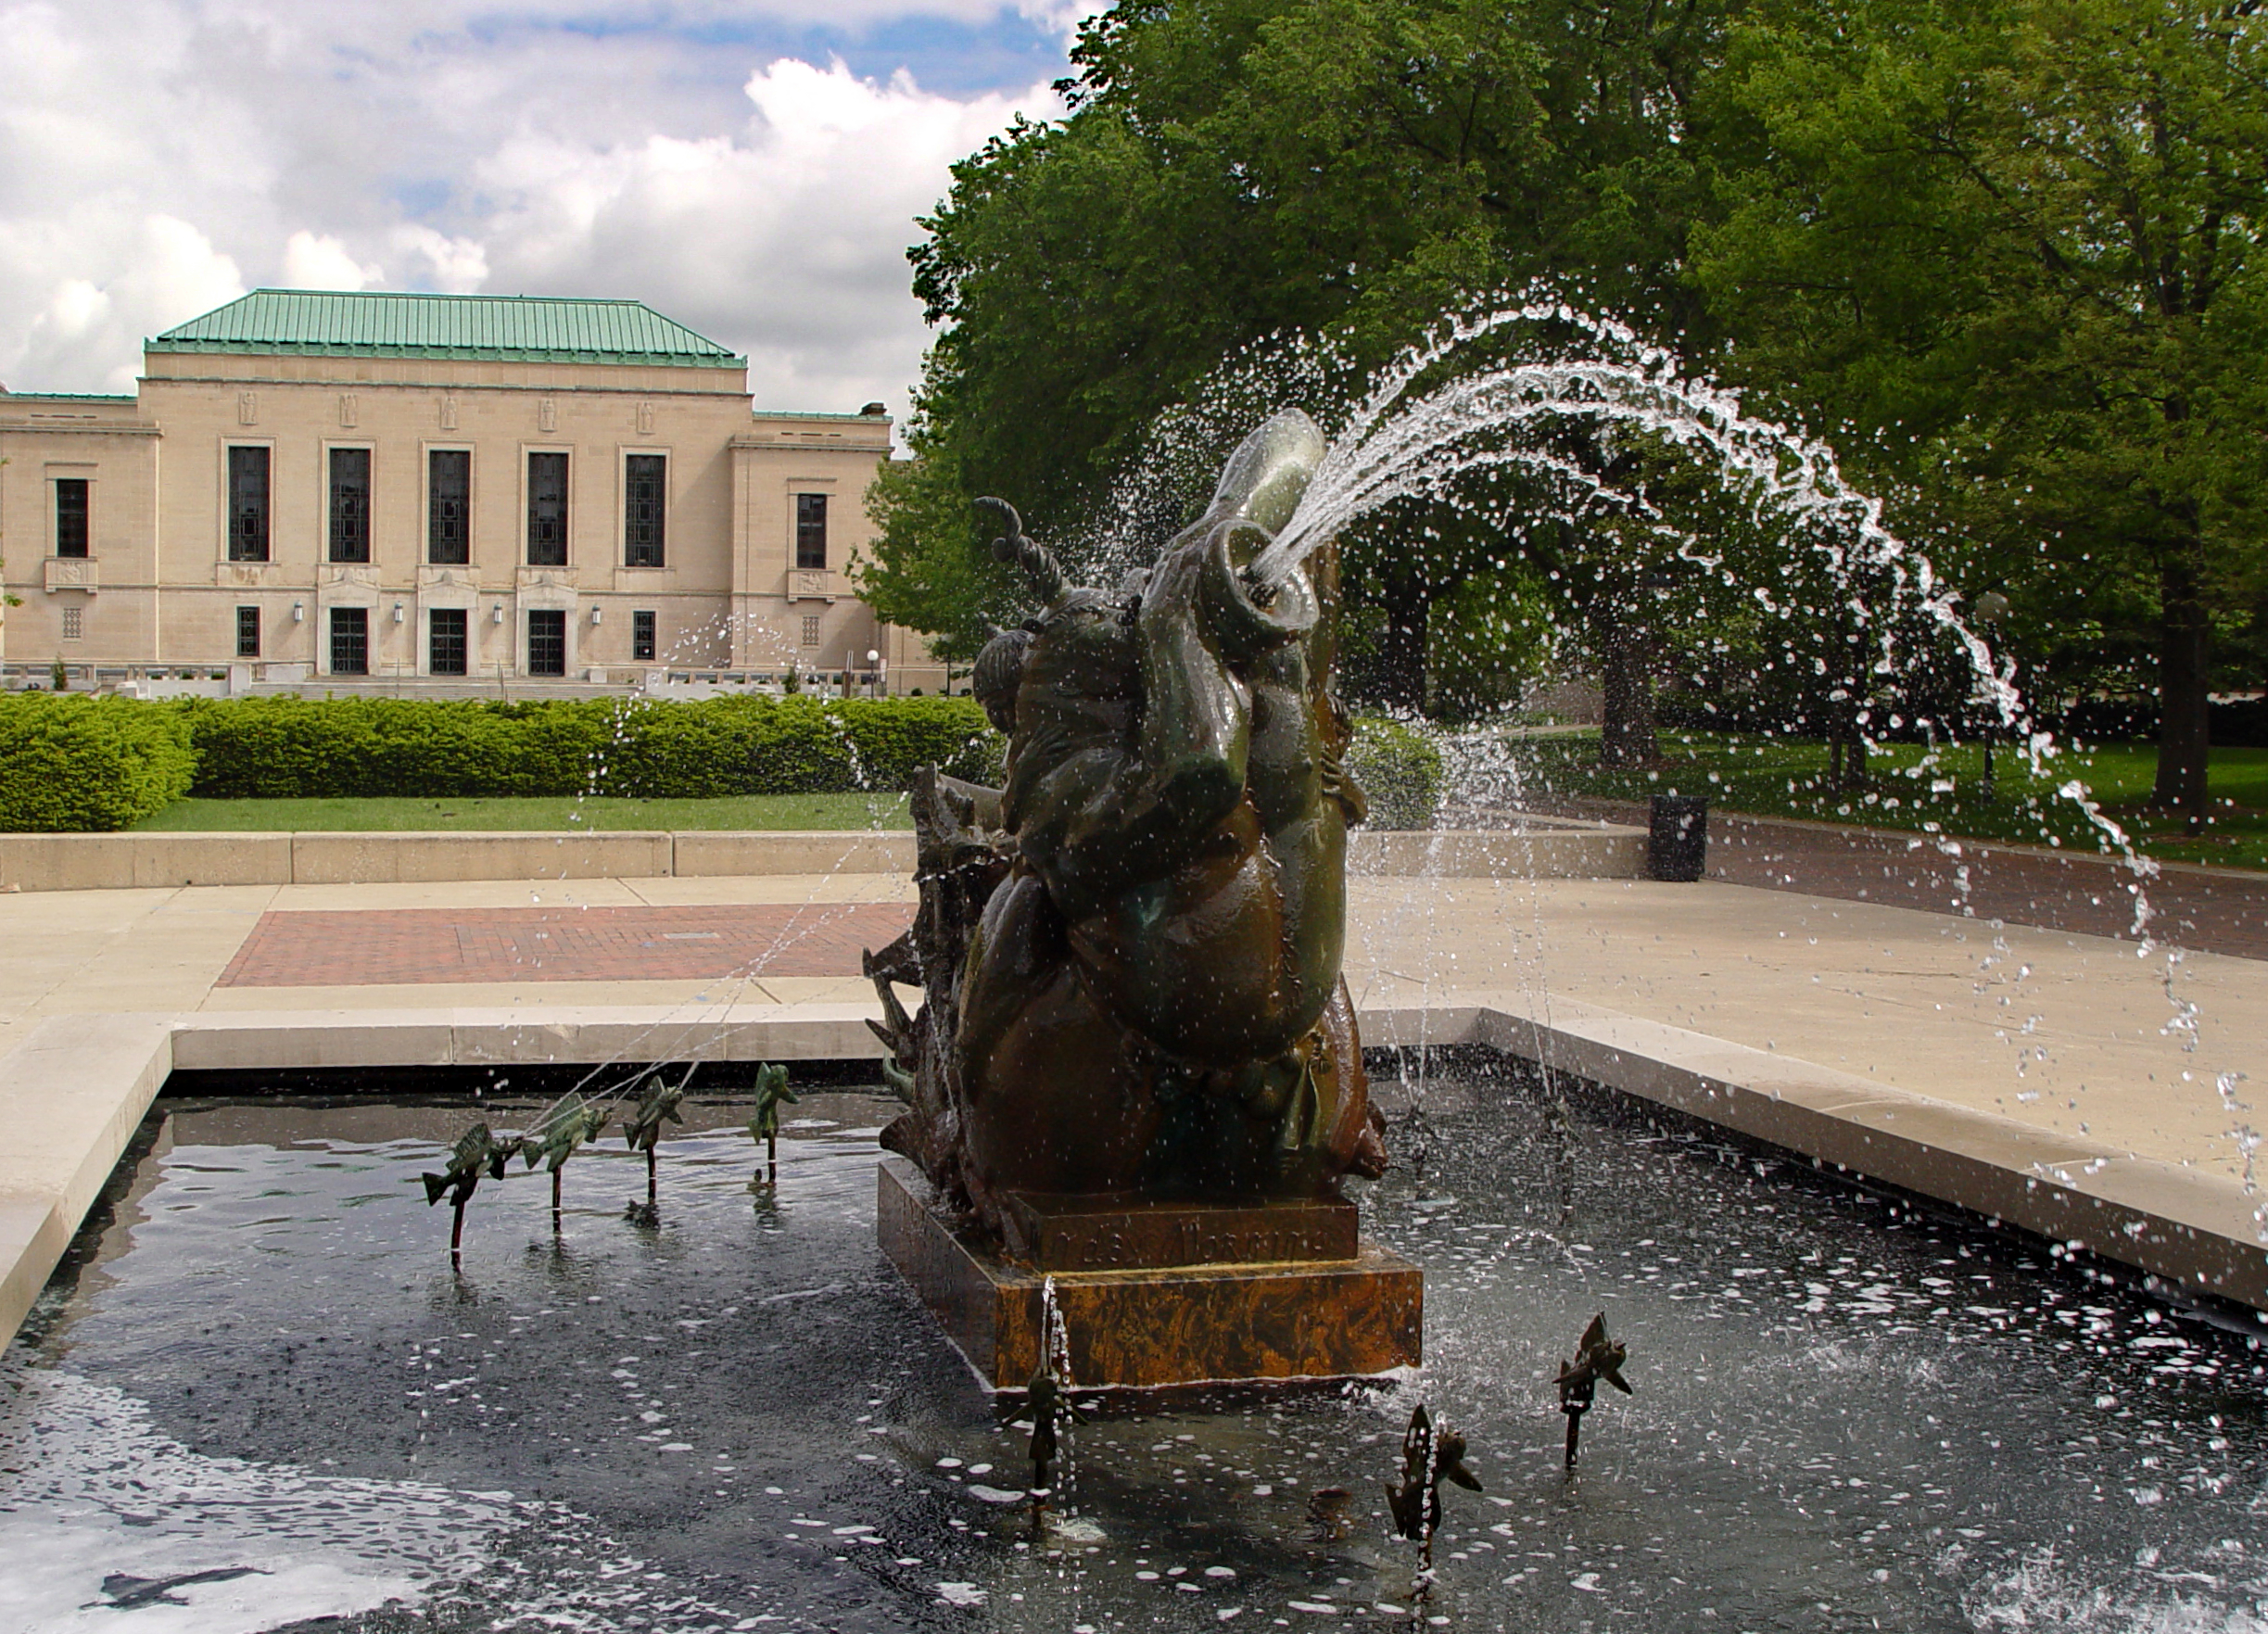 University of Michigan, Ann Arbor (Thomas Rumley/Wikimedia Commons, Creative Commons)